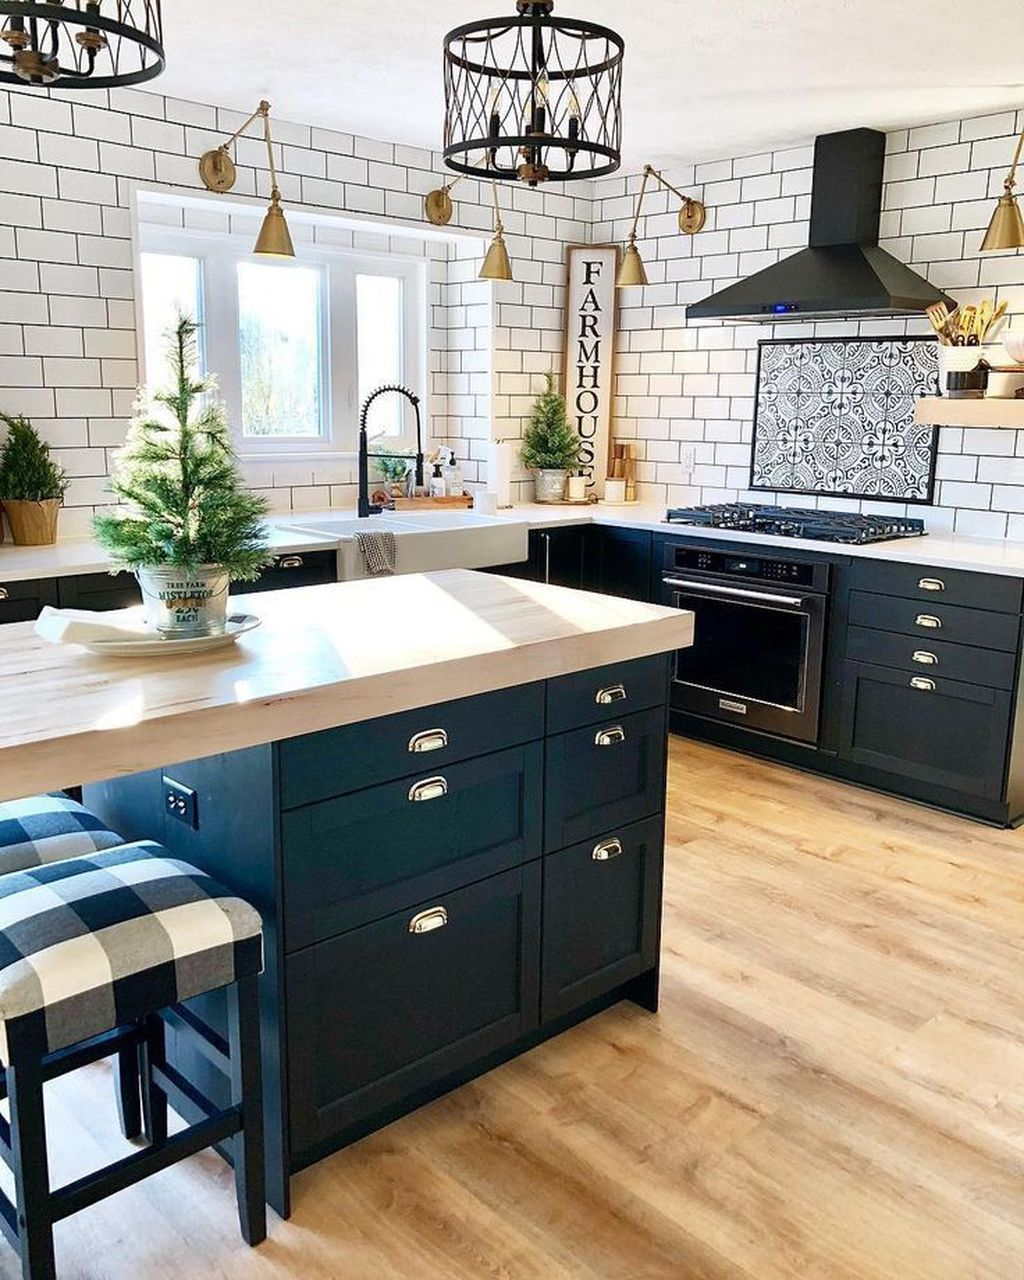 The Best Farmhouse Kitchen Decor Ideas 11